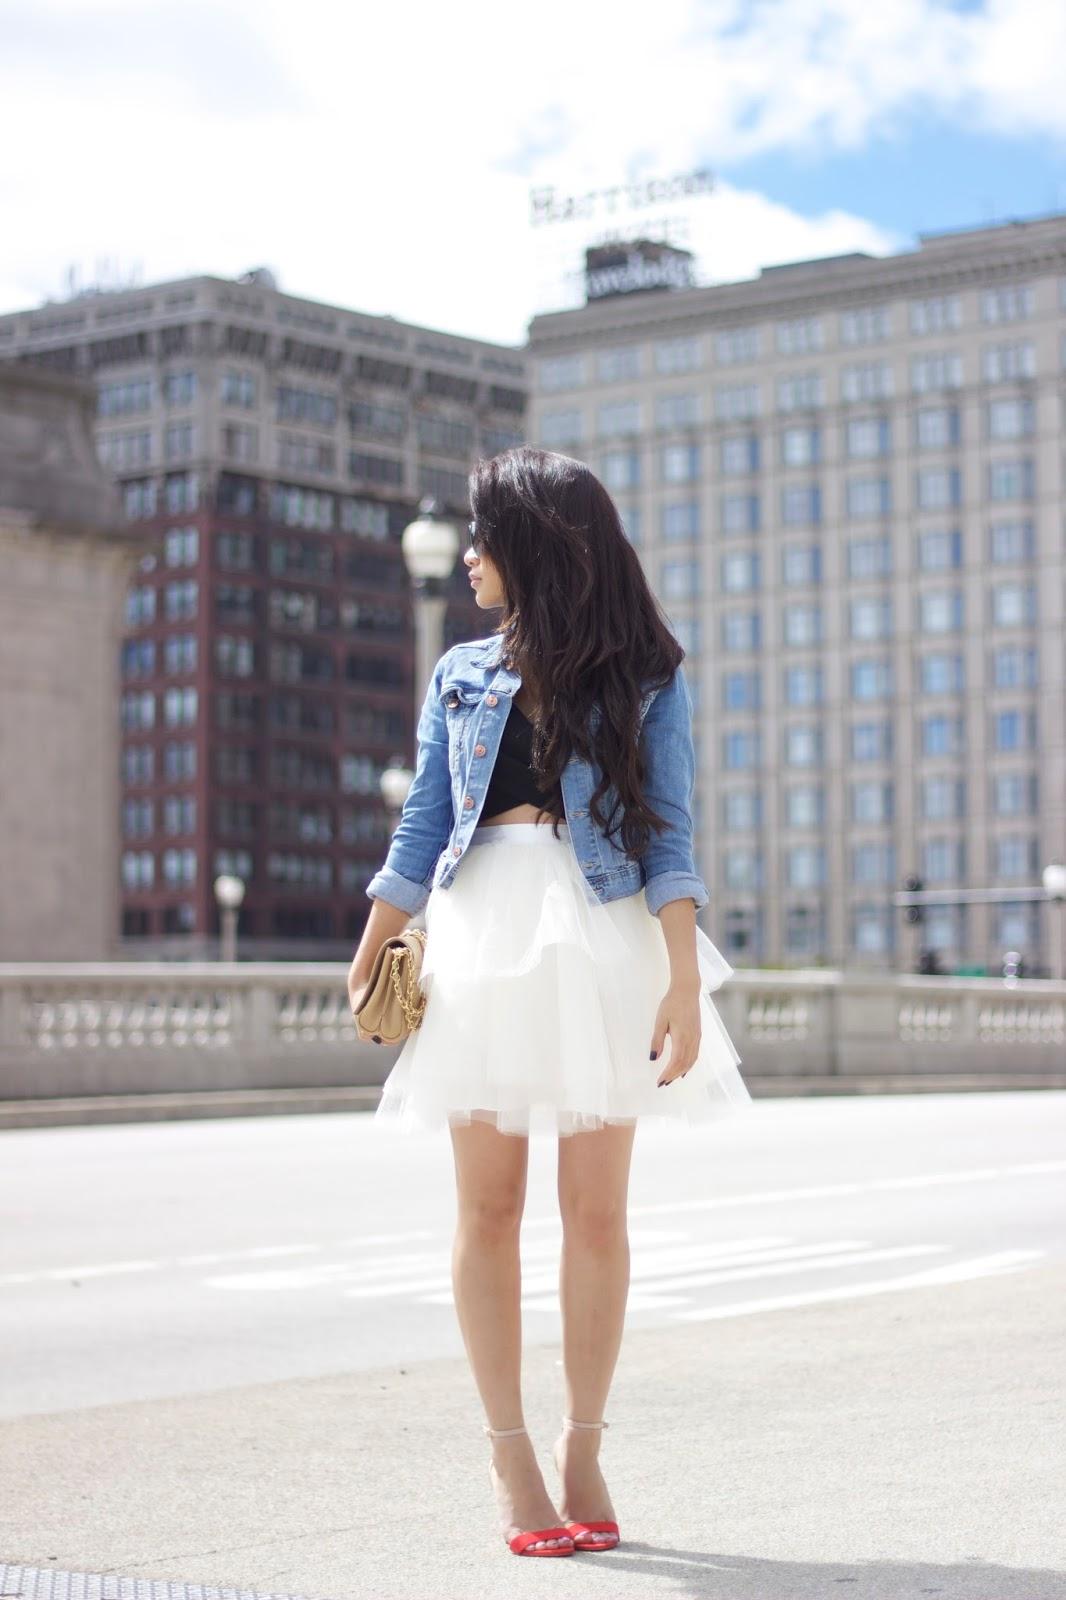 Tulle skirts, tutu skirts, fashion blogger, melba nguyen, tulle skirt pairing, fendi purse , styling tulle skirts